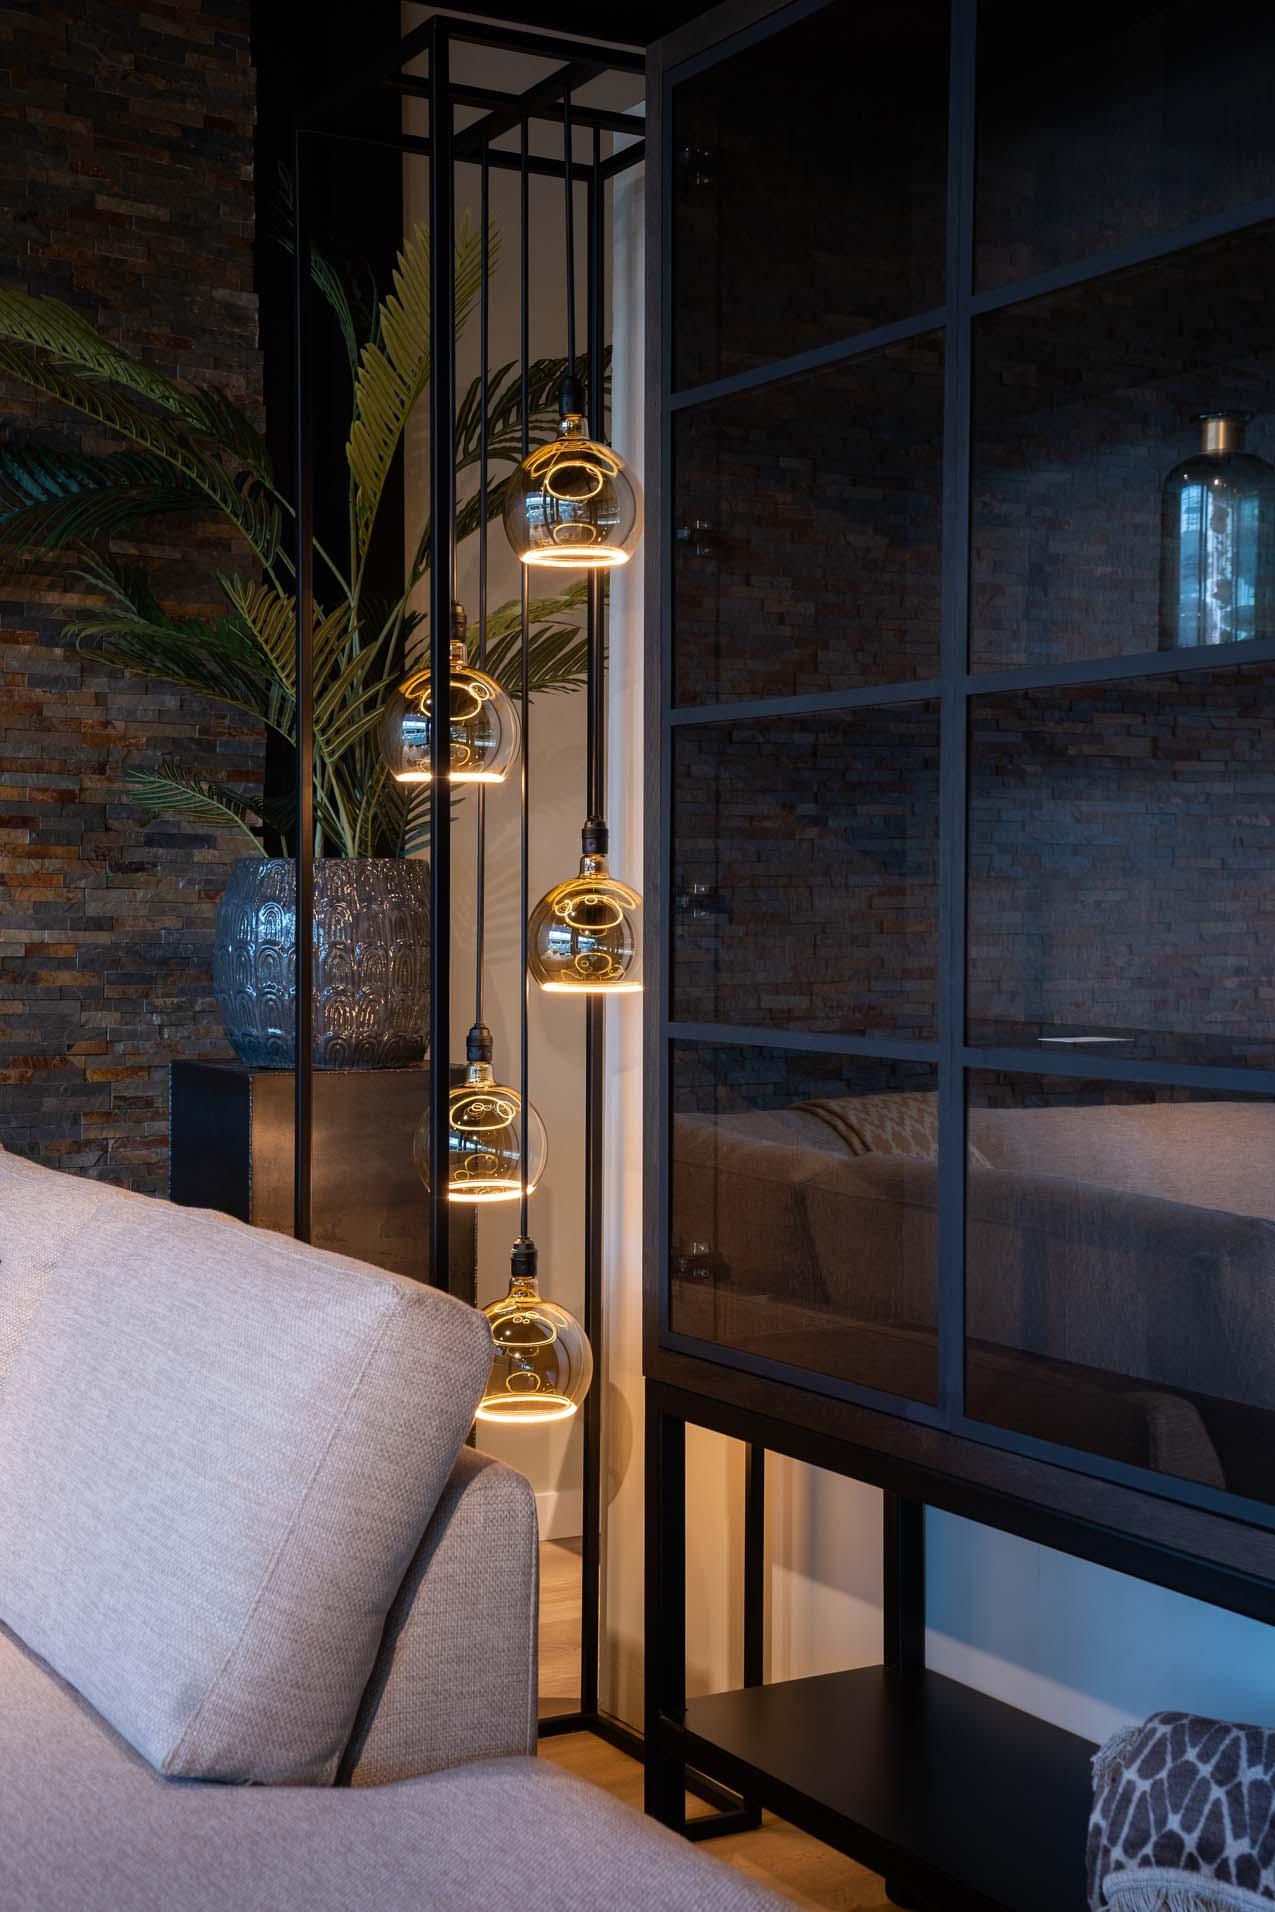 bella milano detailfoto met verlichting soofs interieur